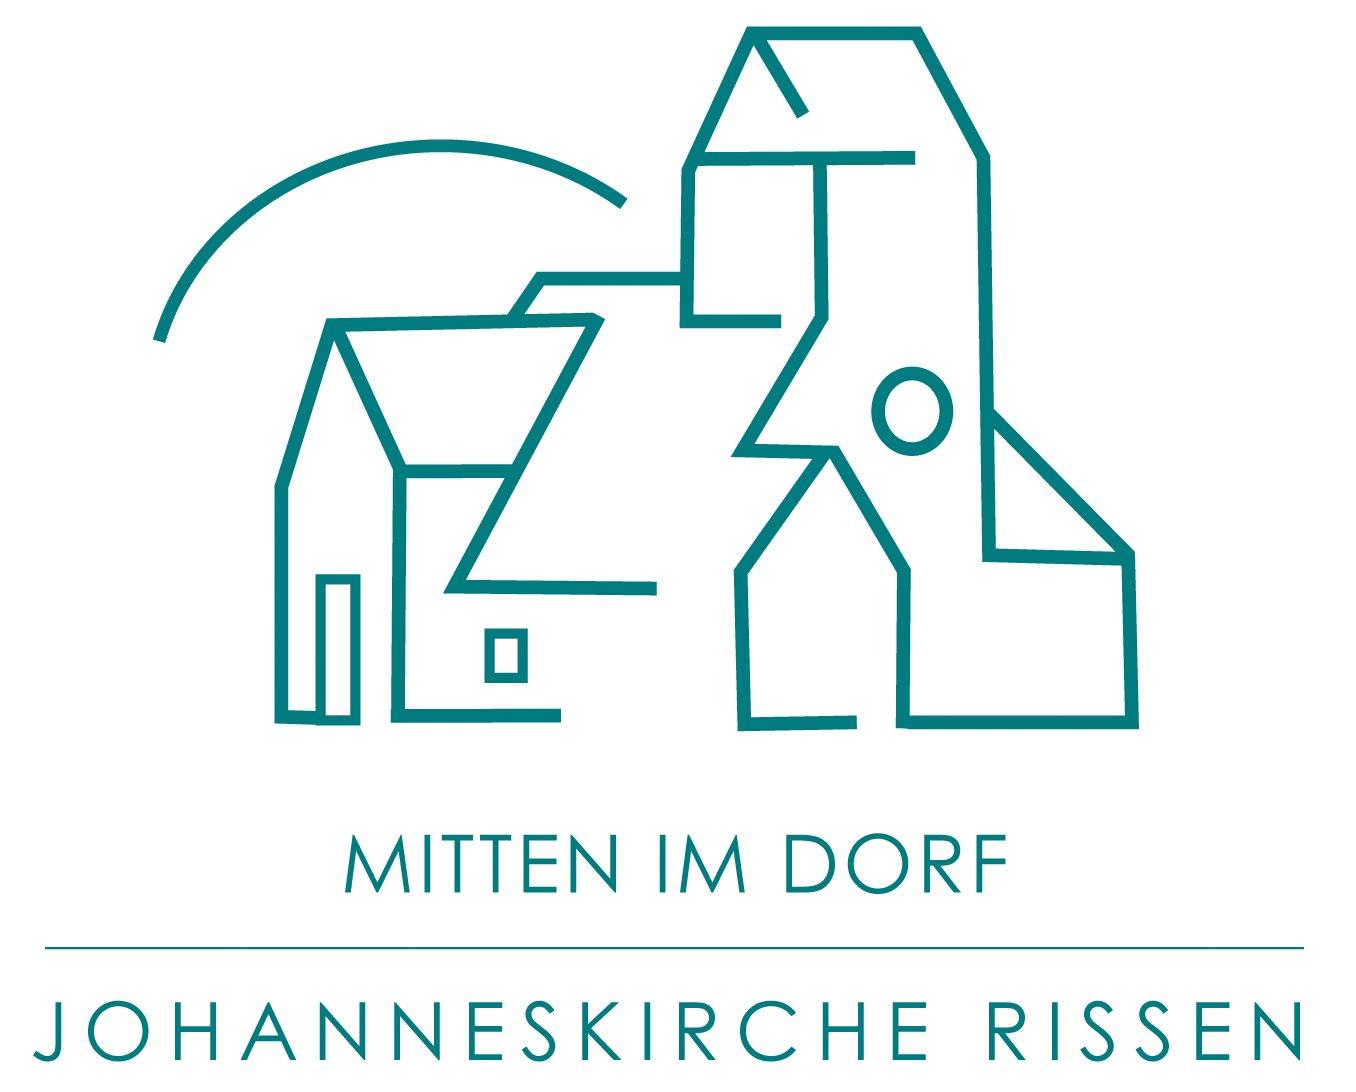 Johanneskirche Rissen Logo